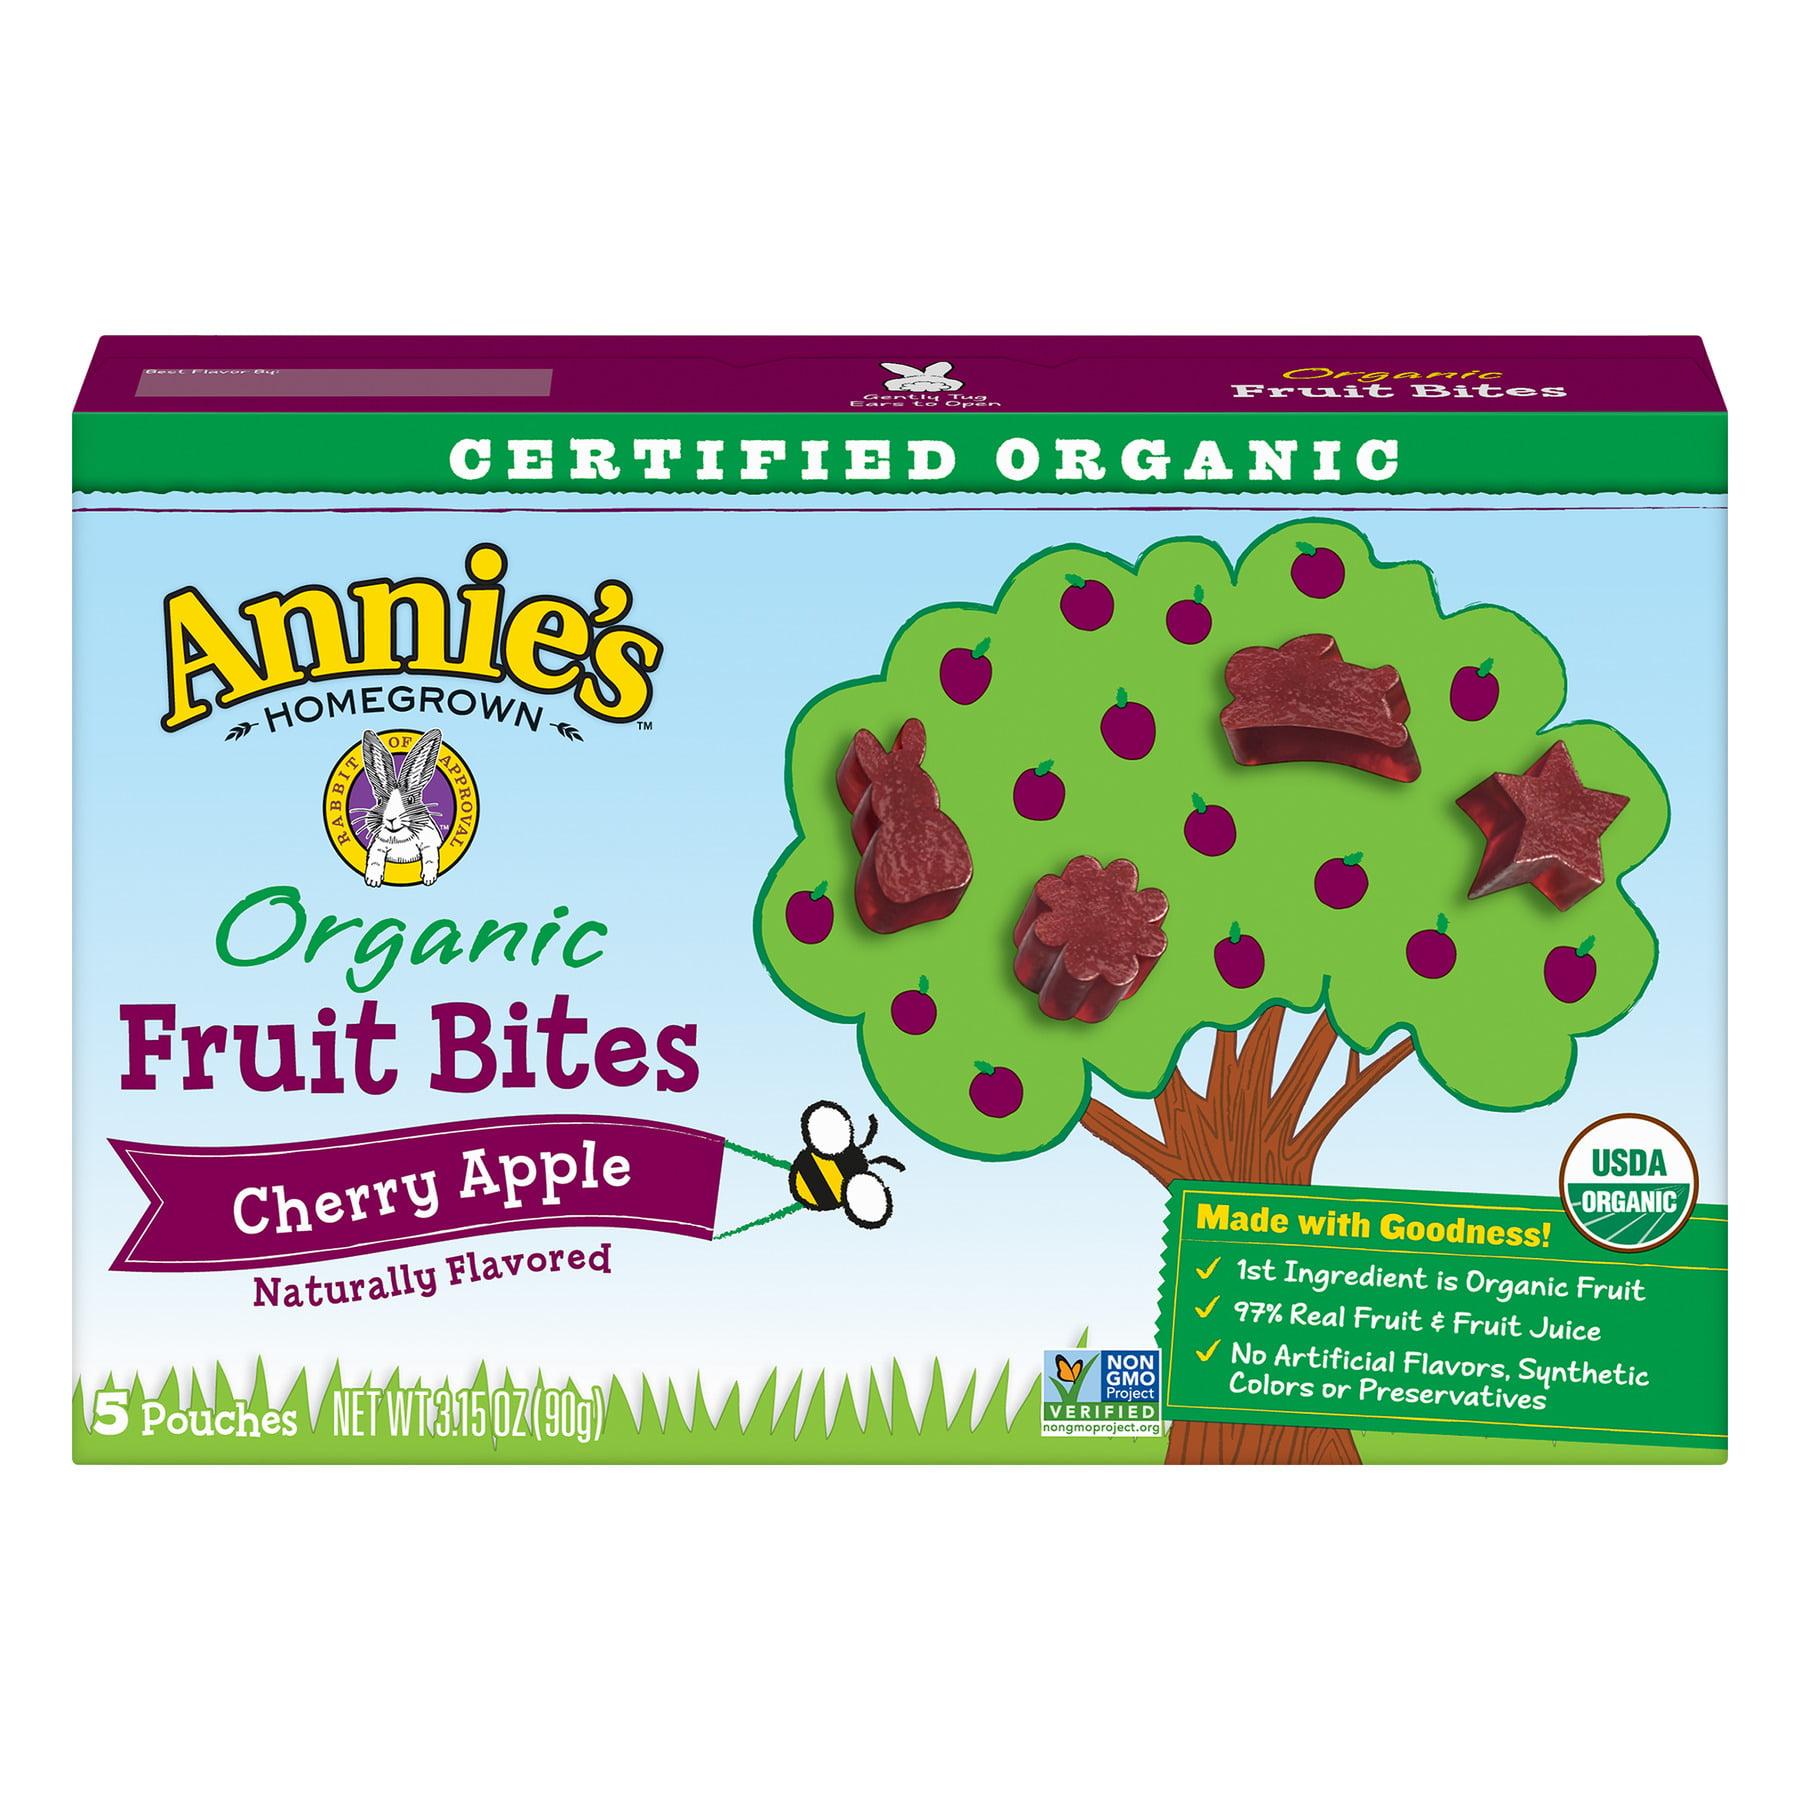 Annie's Organic Cherry Apple Fruit Bites, 5 ct, 3.15 oz